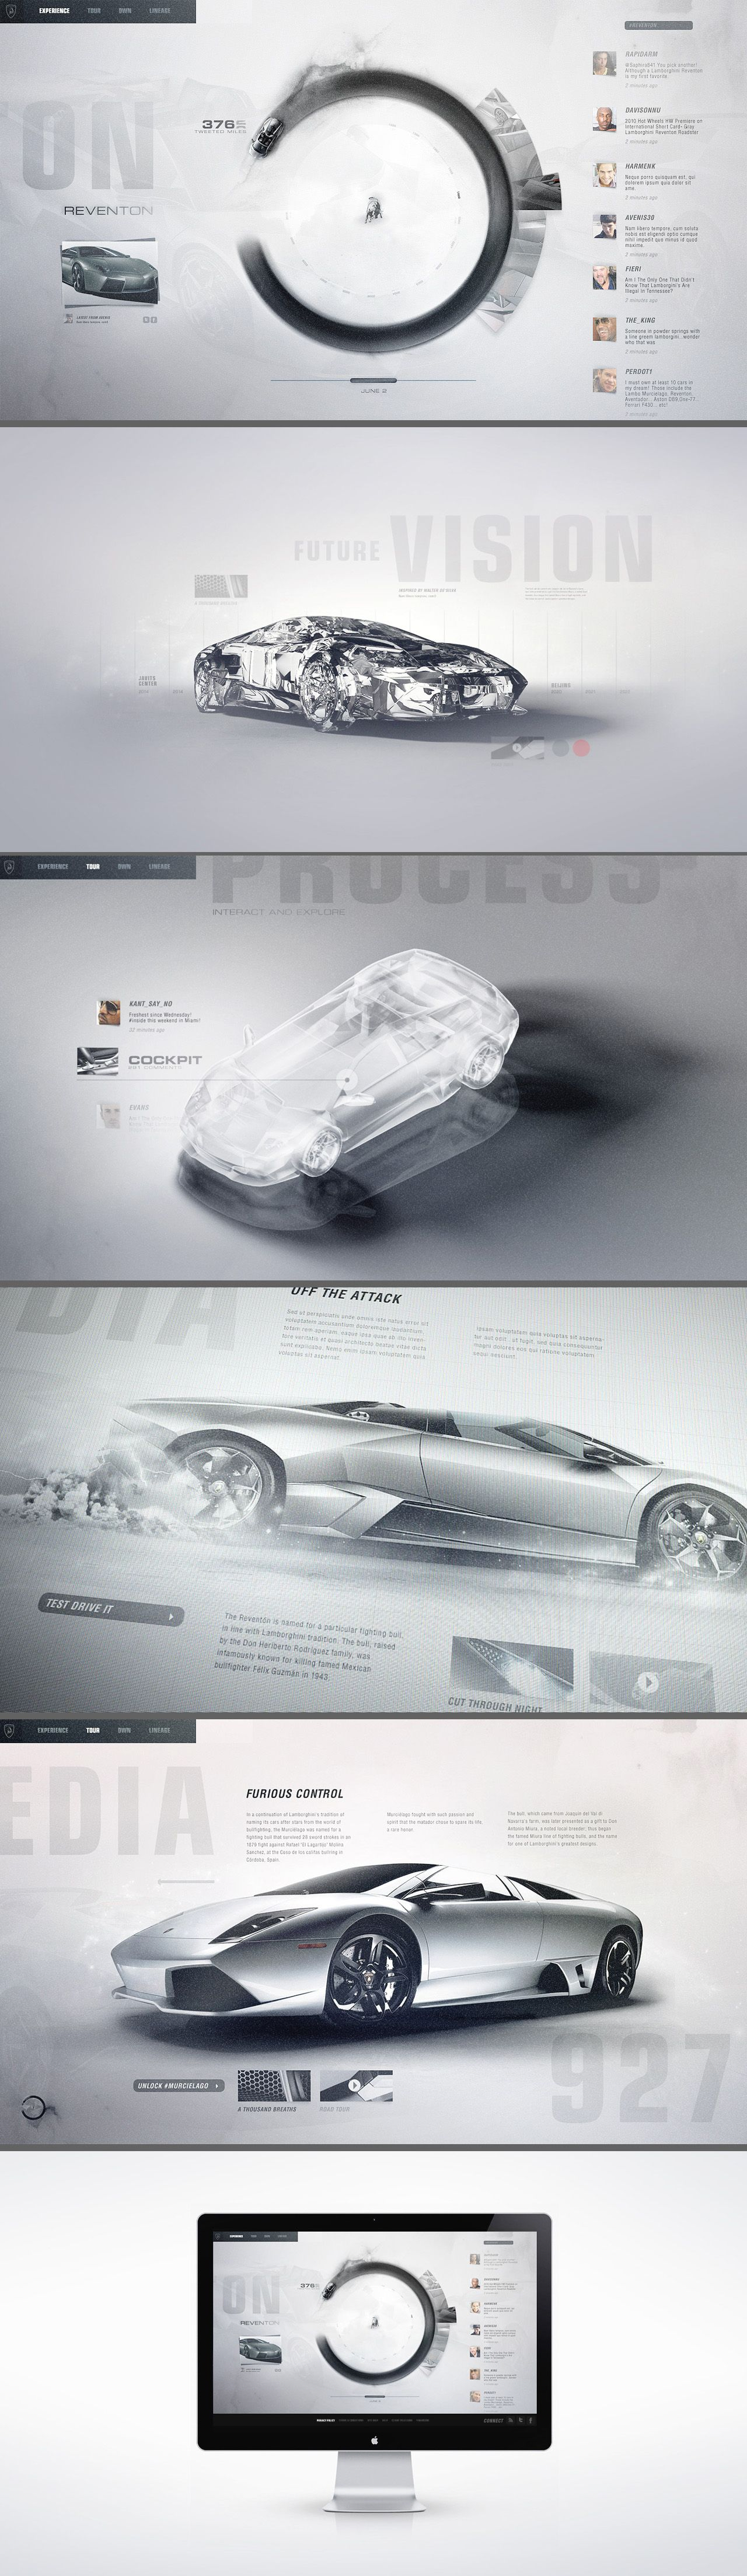 f17fba8fa12bcf843cb65c131a949aea Astounding Lamborghini Countach Built In Basement Cars Trend